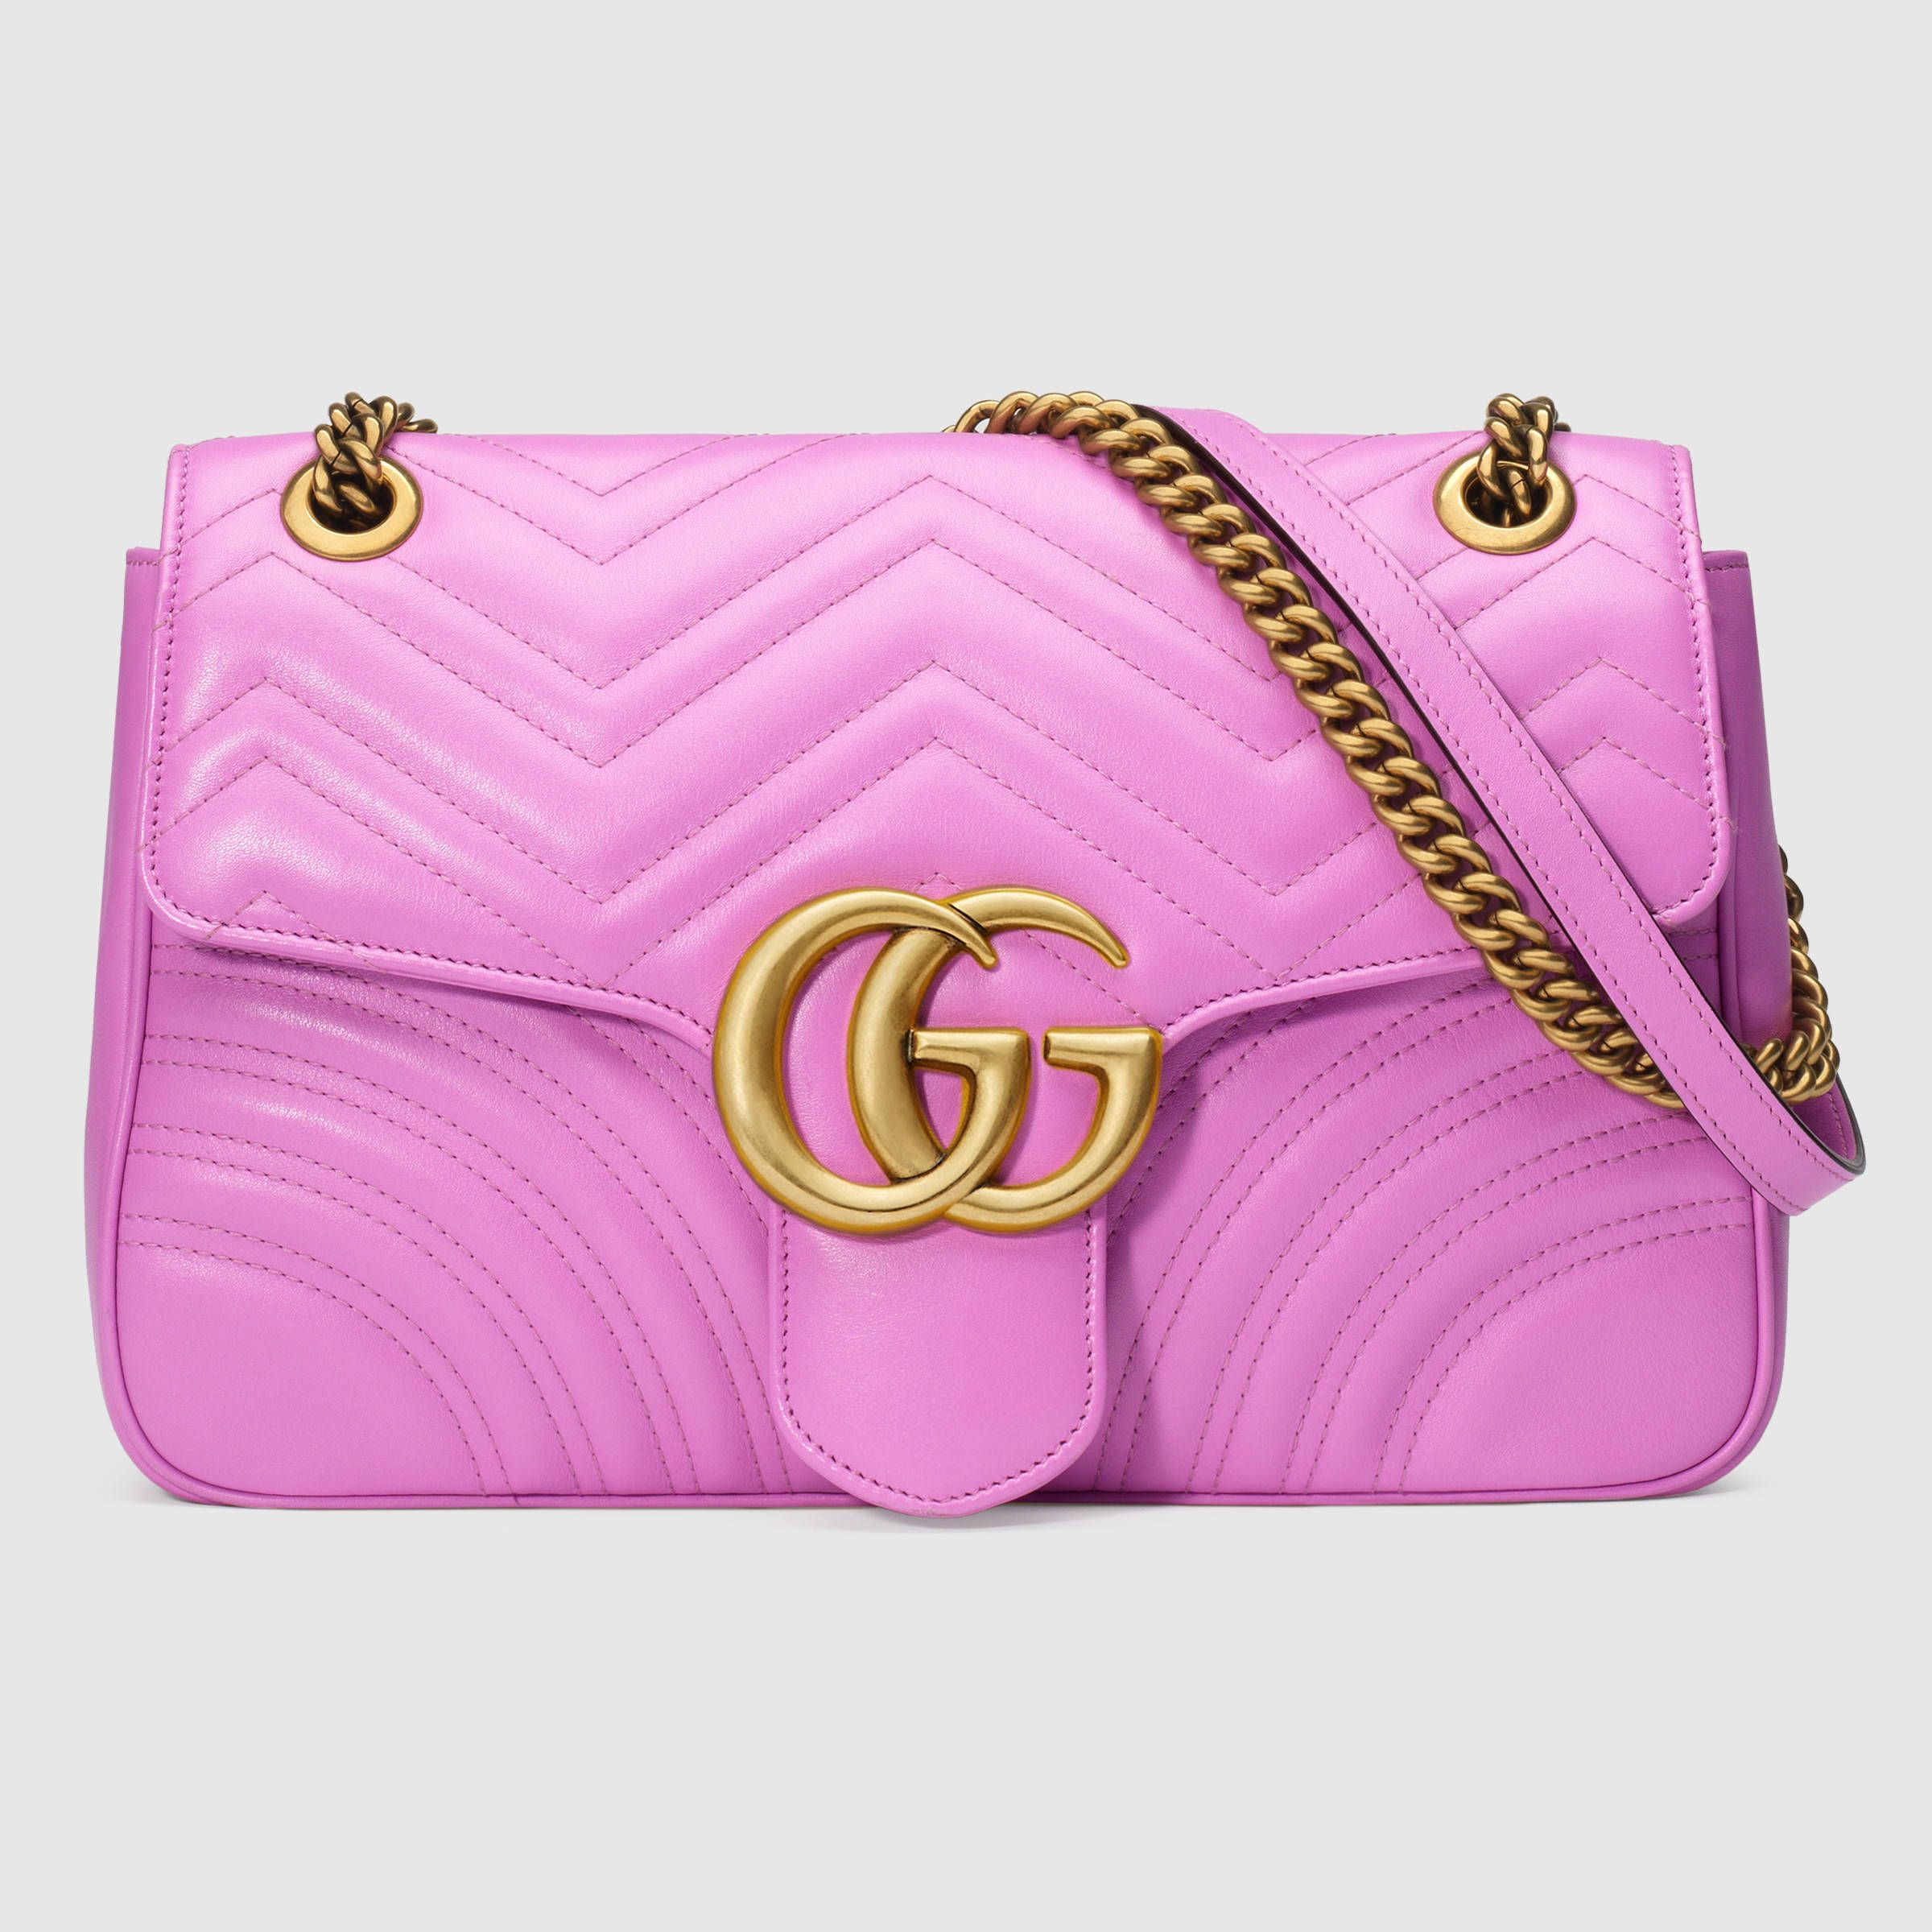 953fd0fbe6f3 GG Marmont matelassé shoulder bag in 2019 | Pretty Things | Gucci ...